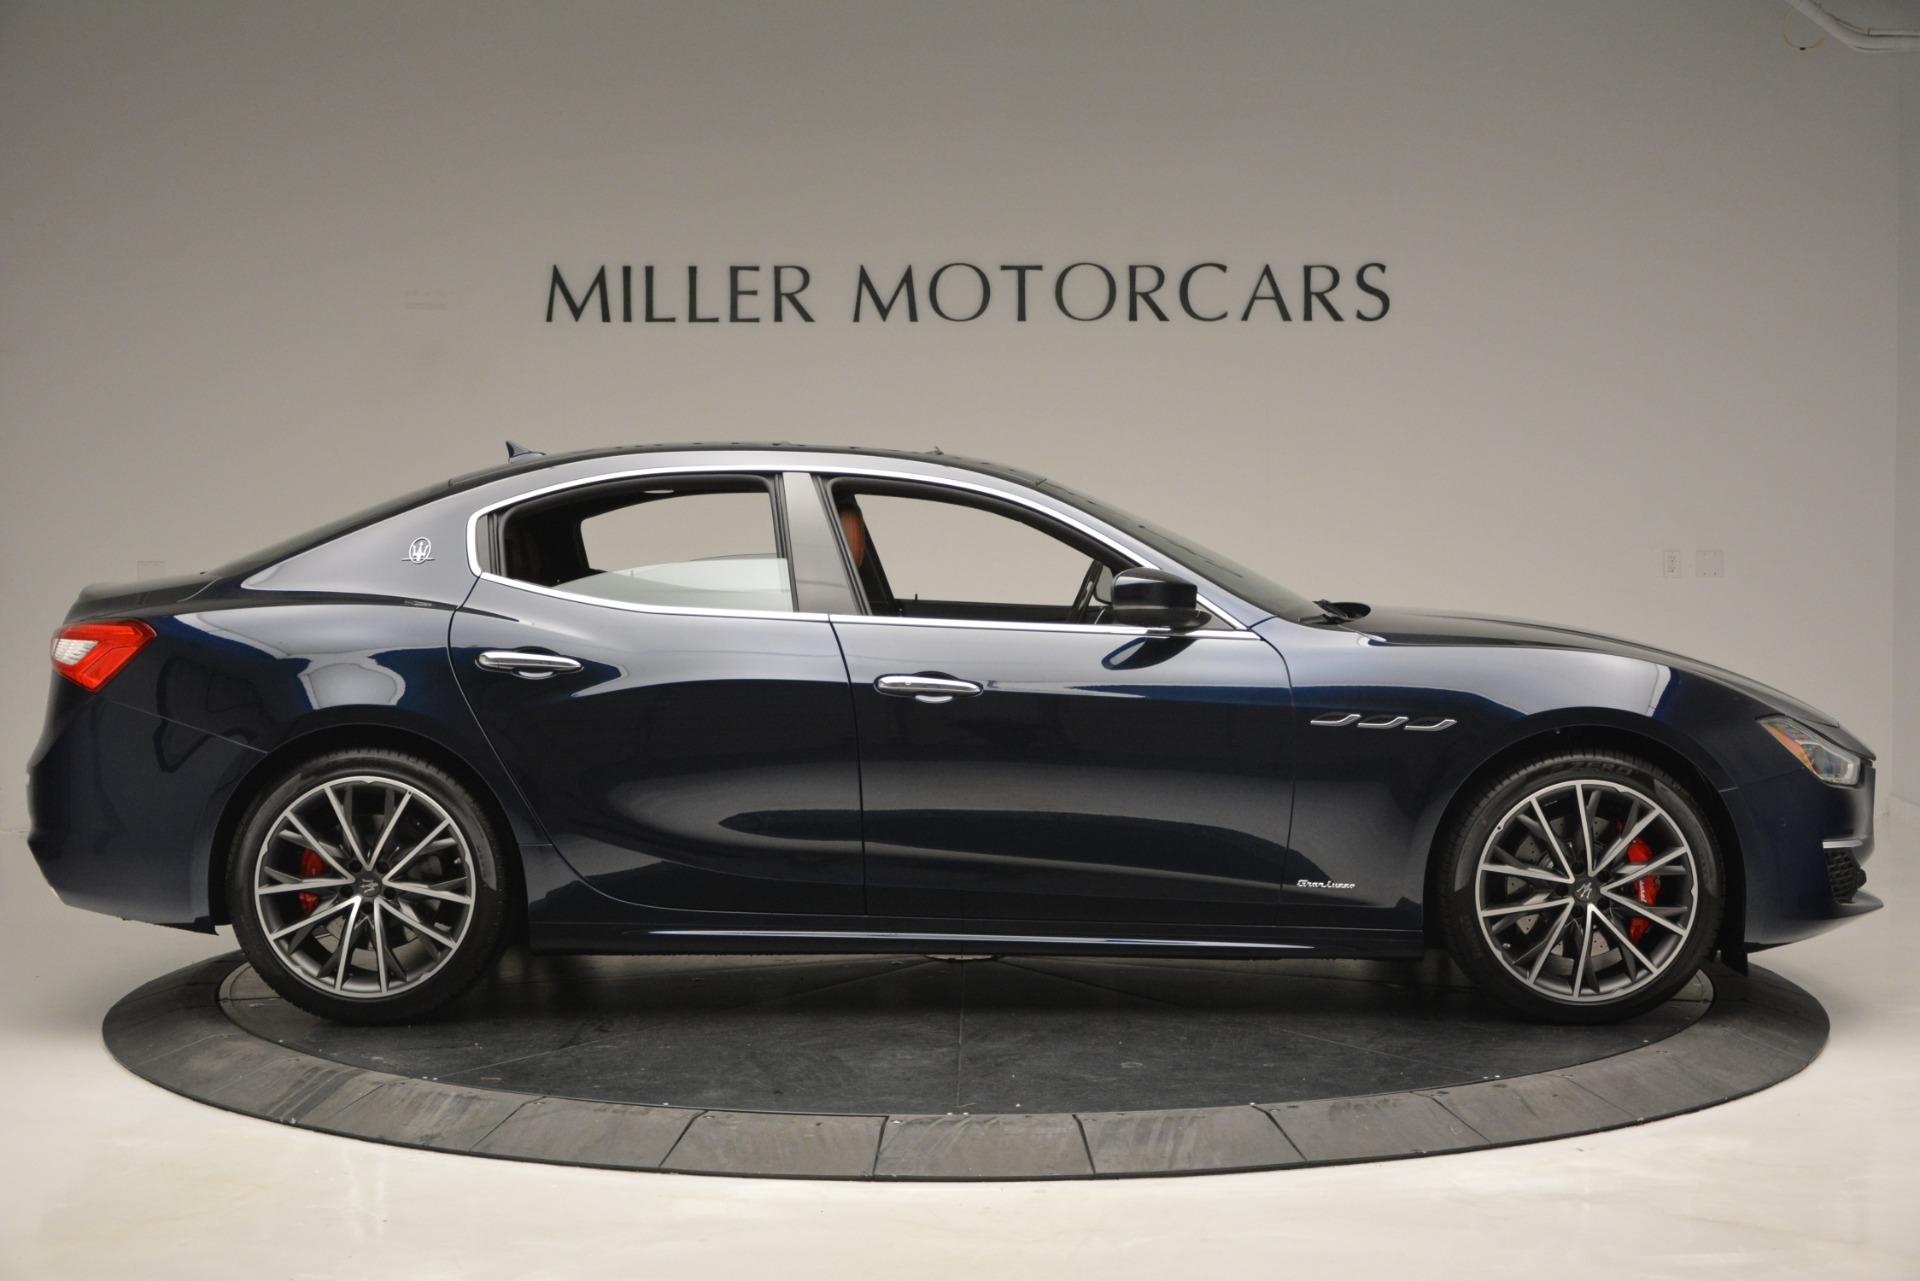 New 2019 Maserati Ghibli S Q4 GranSport For Sale In Greenwich, CT. Alfa Romeo of Greenwich, M2264 2948_p13